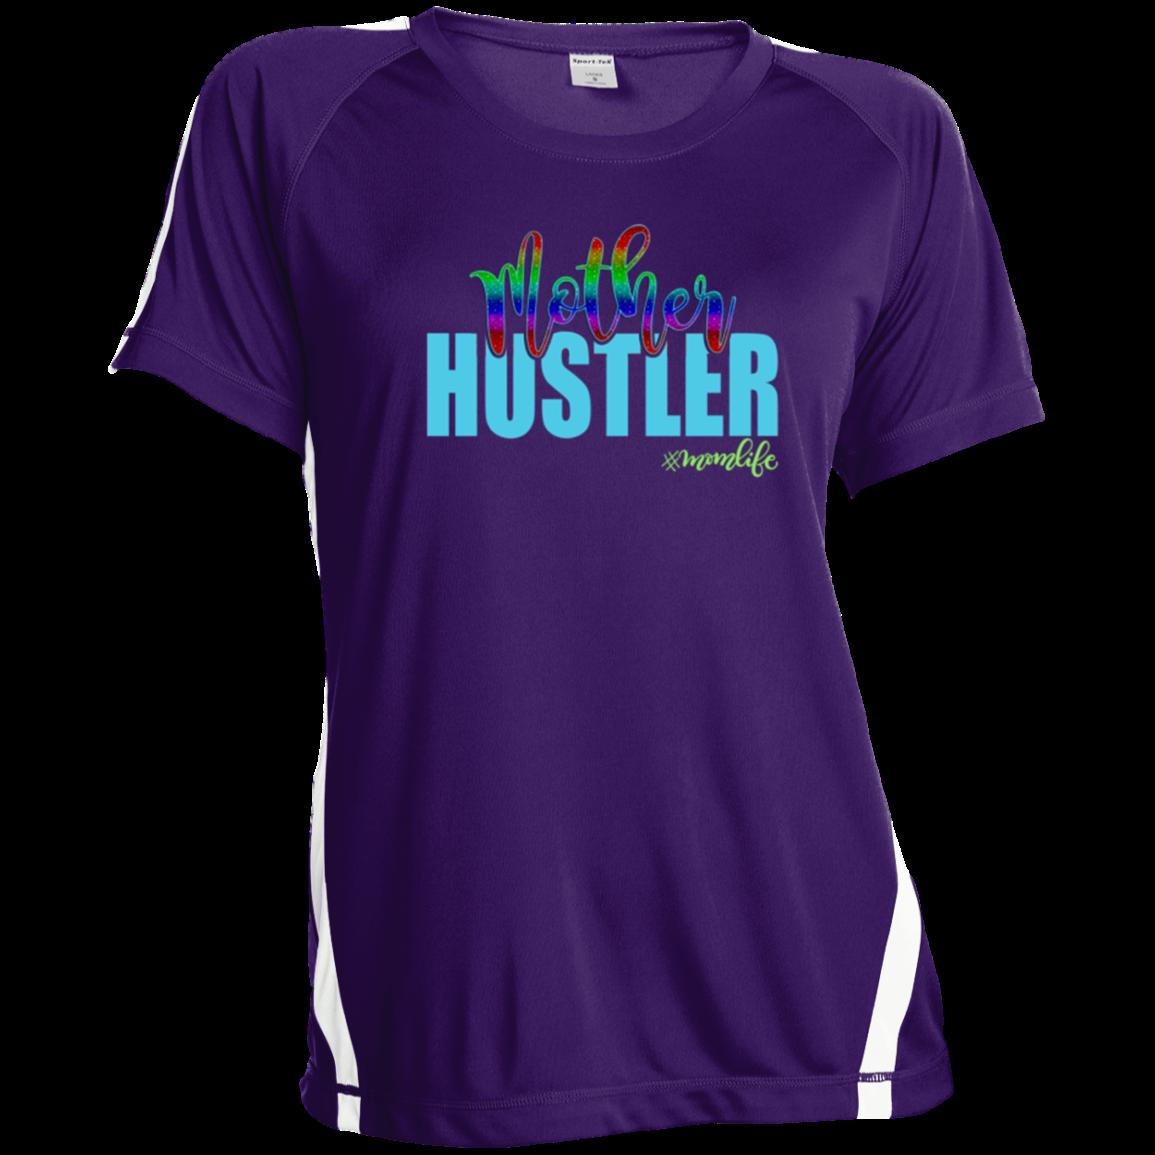 Commit Block hustler shirt t from it